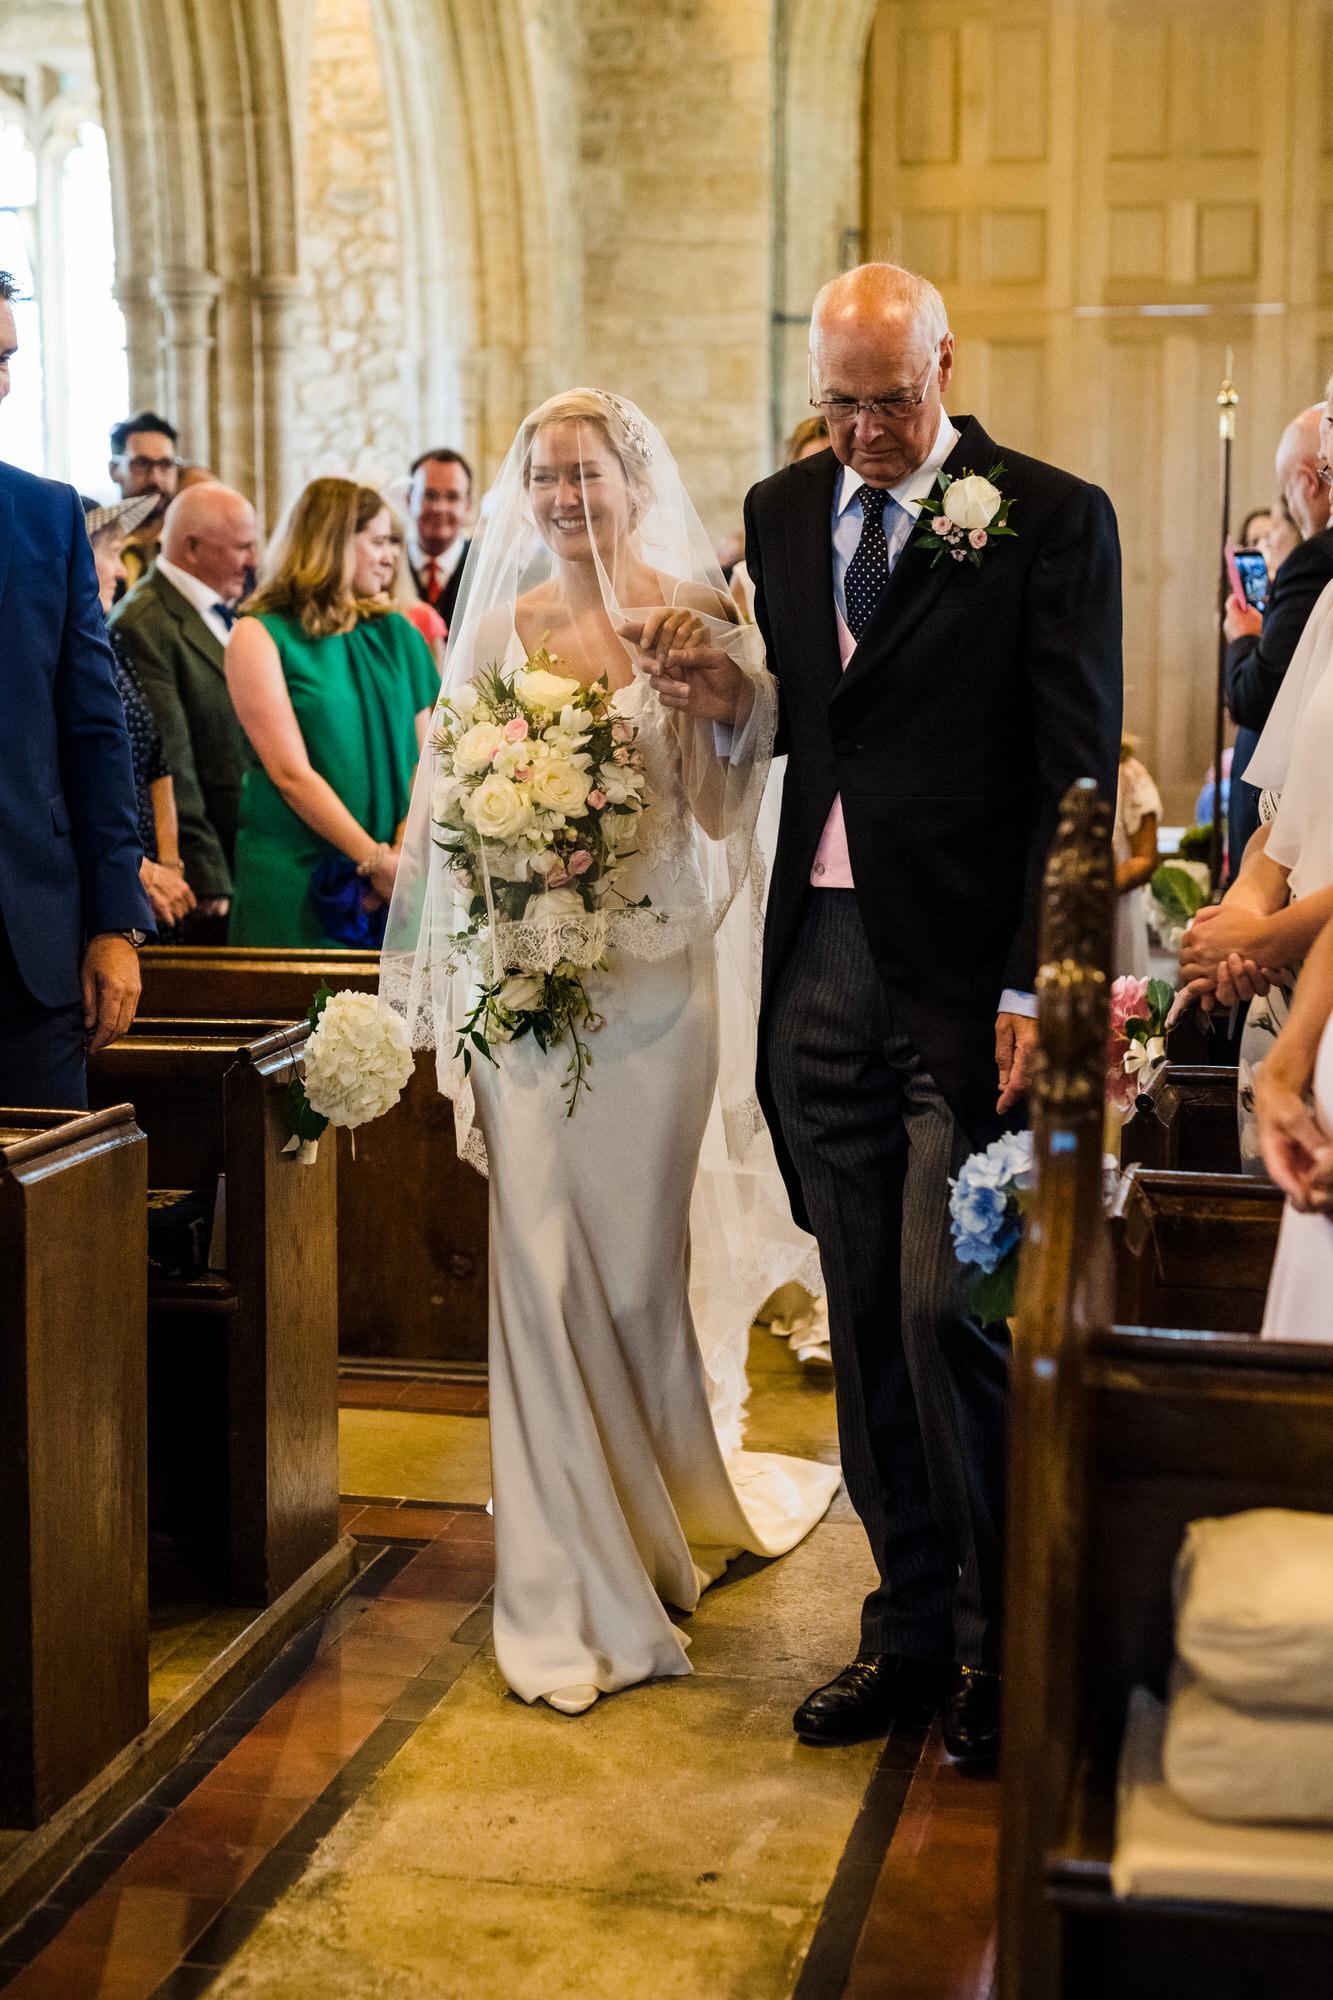 Dorset marquee wedding by the sea simon biffen photography 14